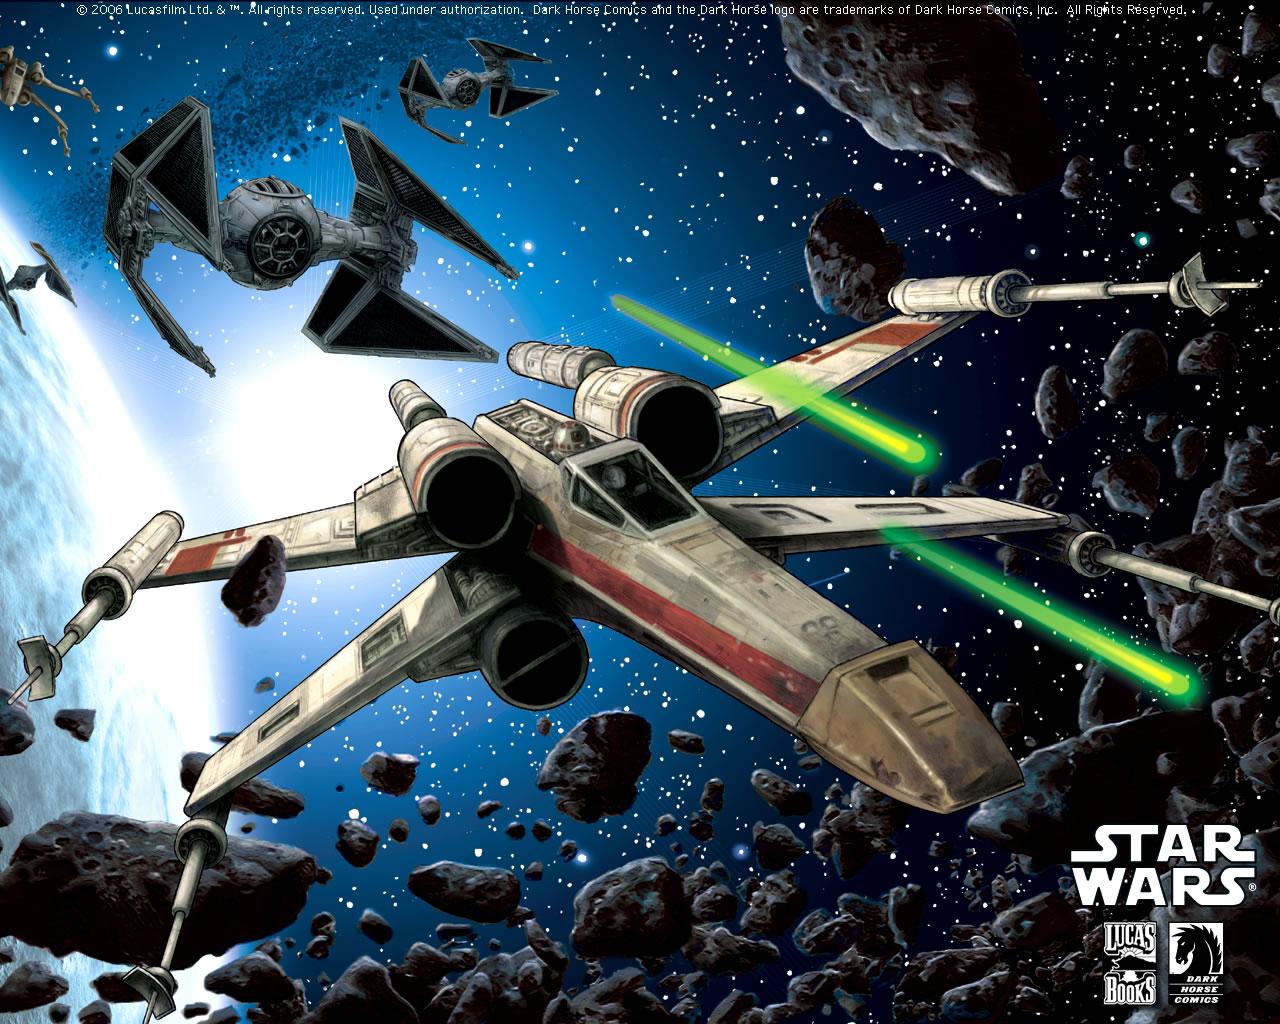 48 Star Wars X Wing Wallpaper On Wallpapersafari